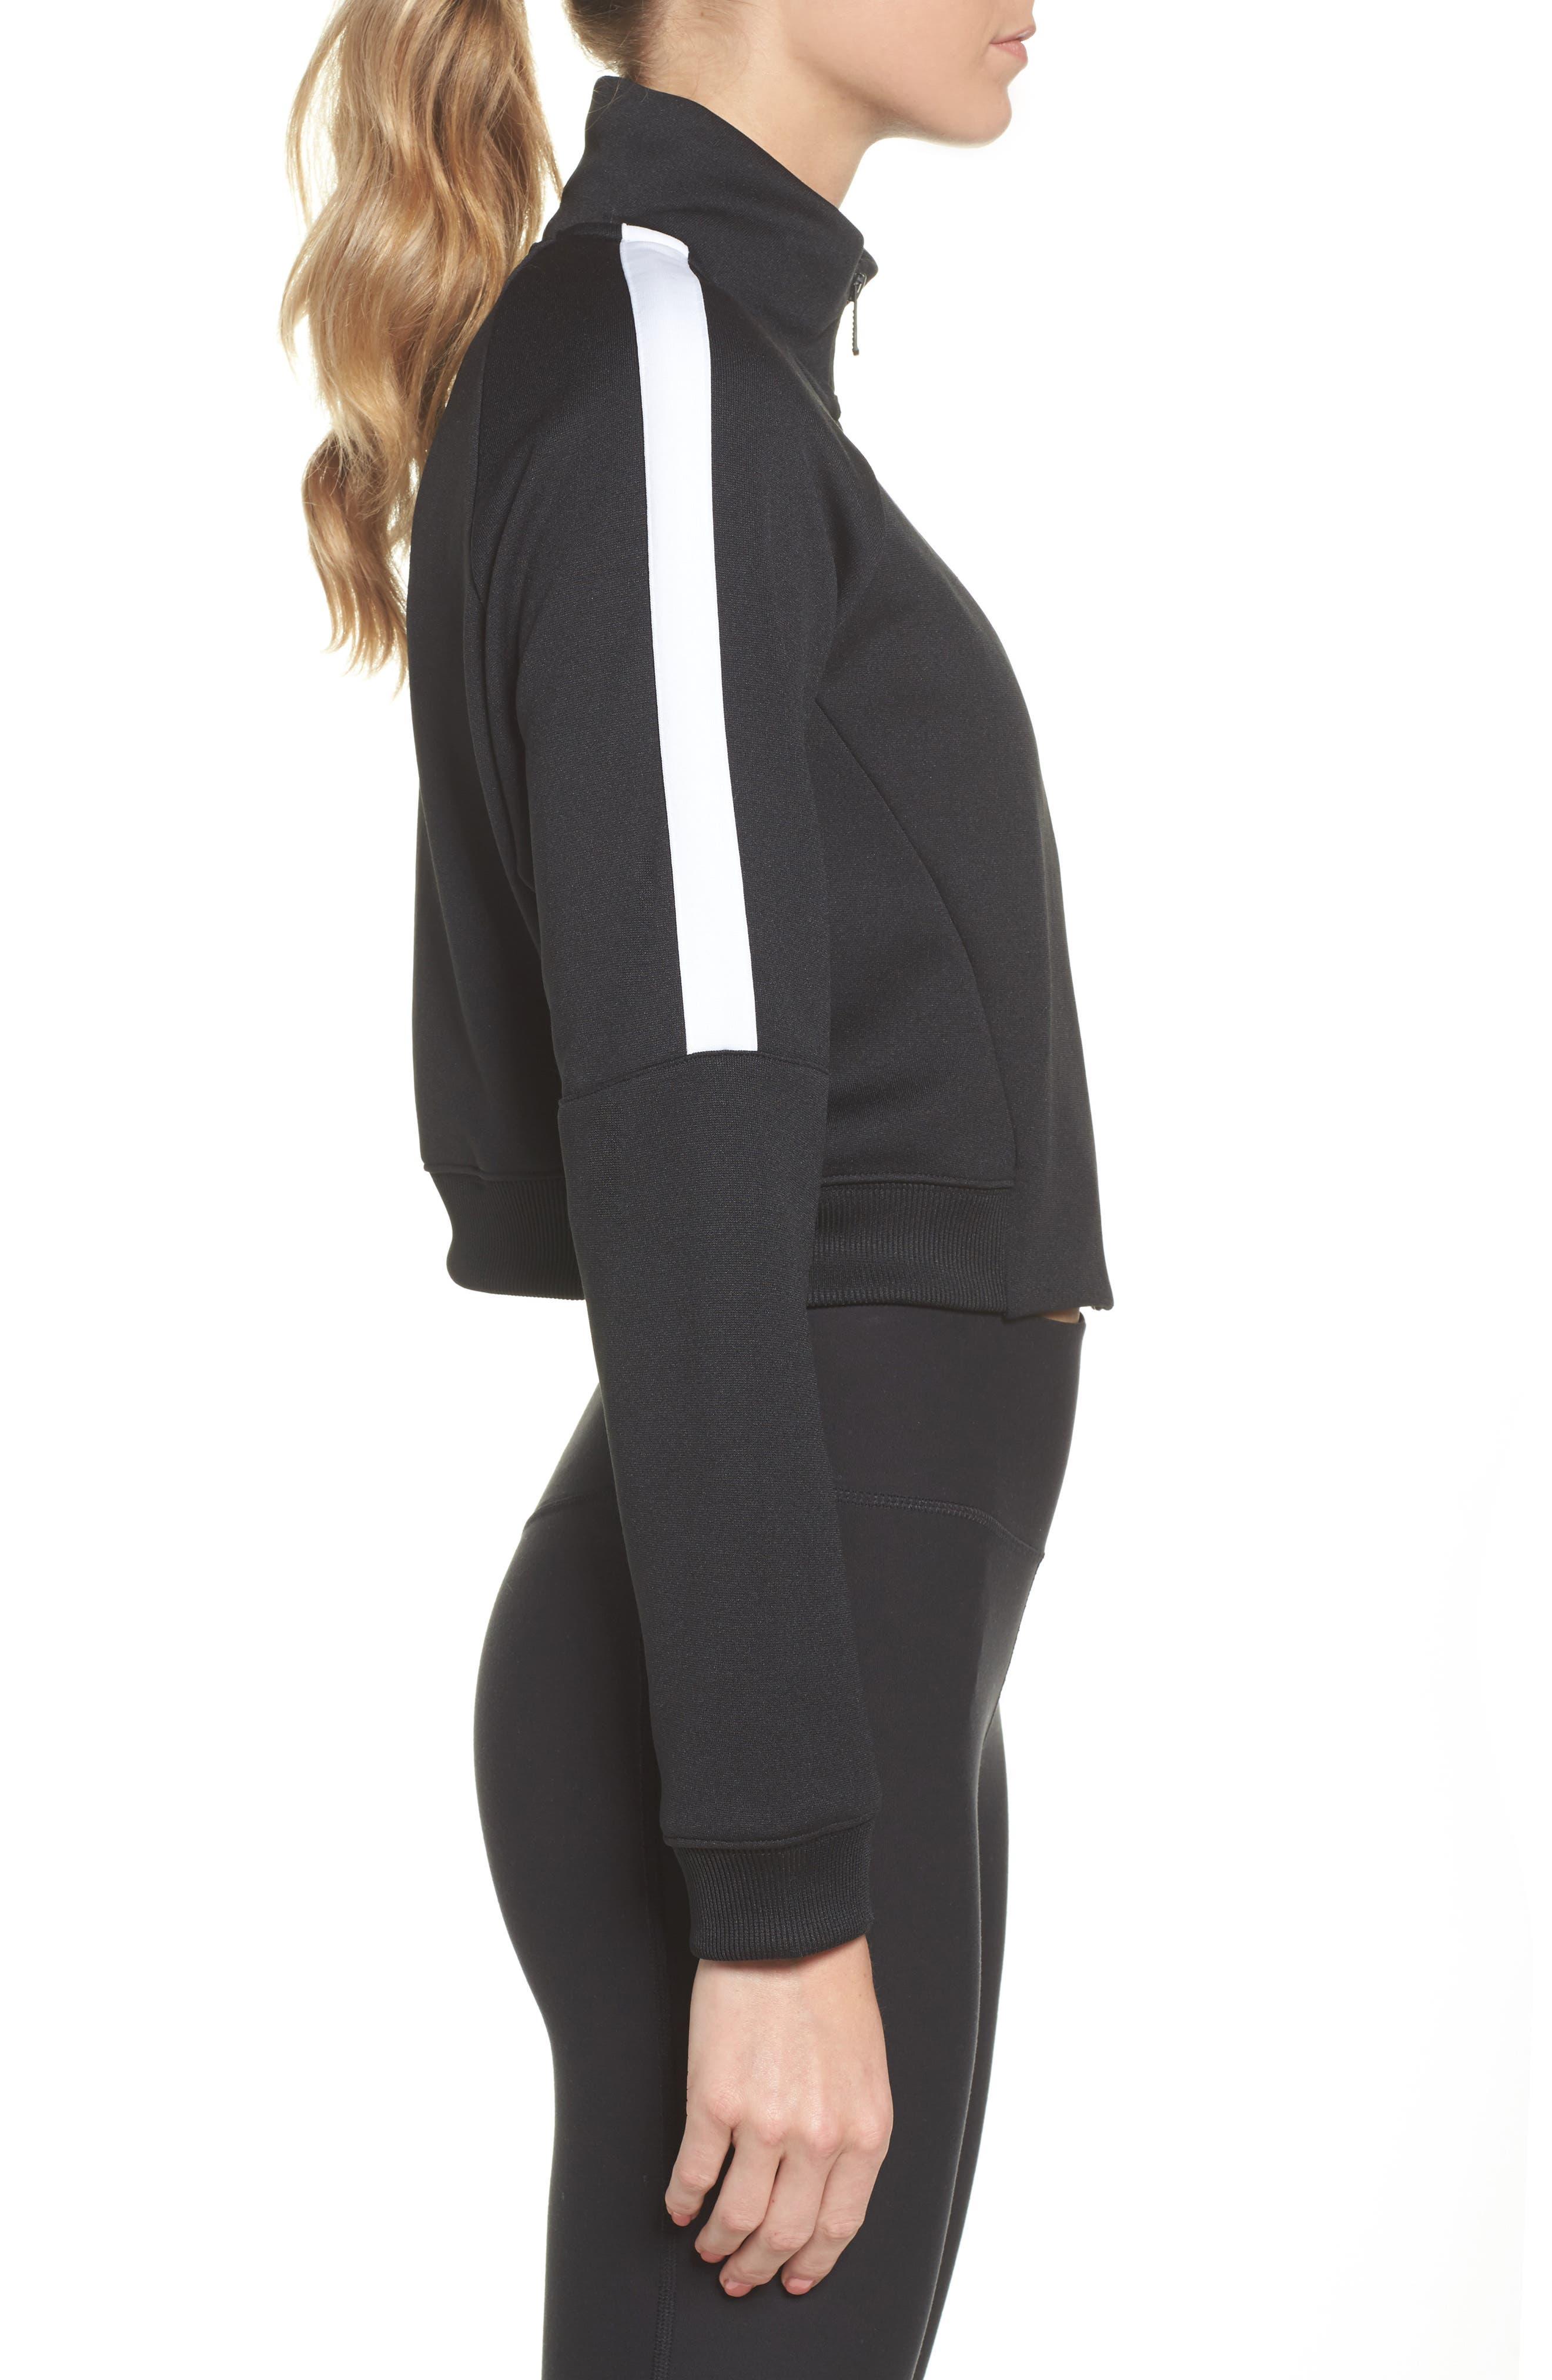 Sportswear N98 Jacket,                             Alternate thumbnail 3, color,                             Black/ White